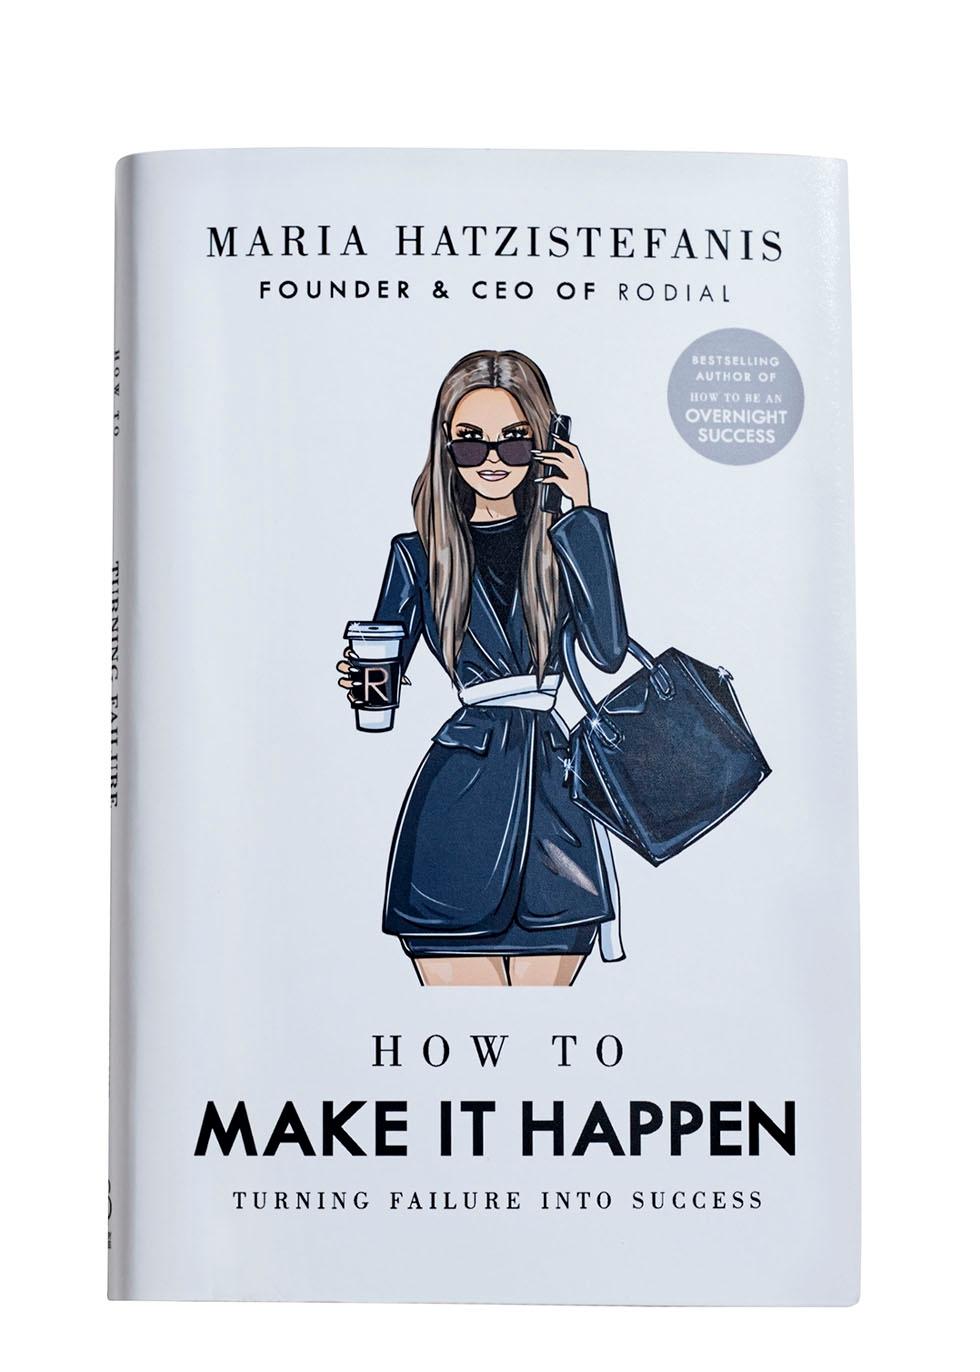 How To Make It Happen by Maria Hatzistefanis